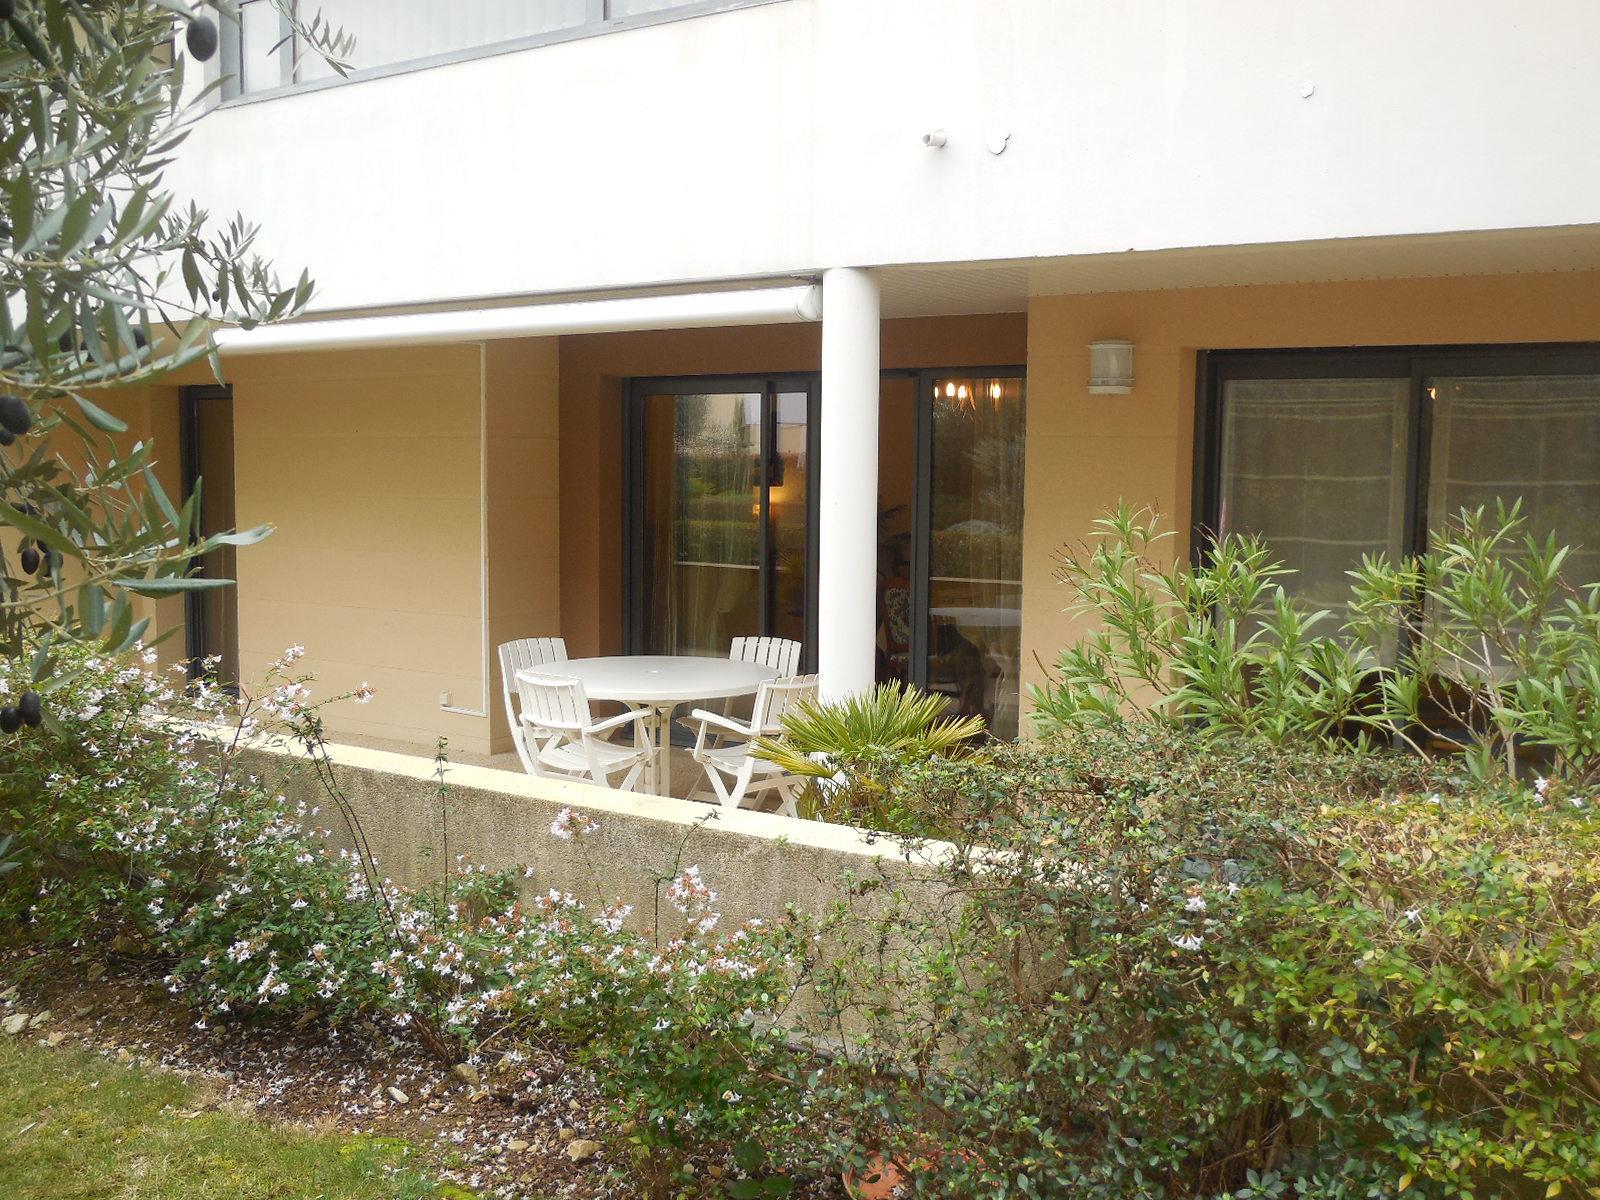 appartement la rochelle LA ROCHELLE - APPARTEMENT DE TYPE 3 - RESIDENCE DE STANDING